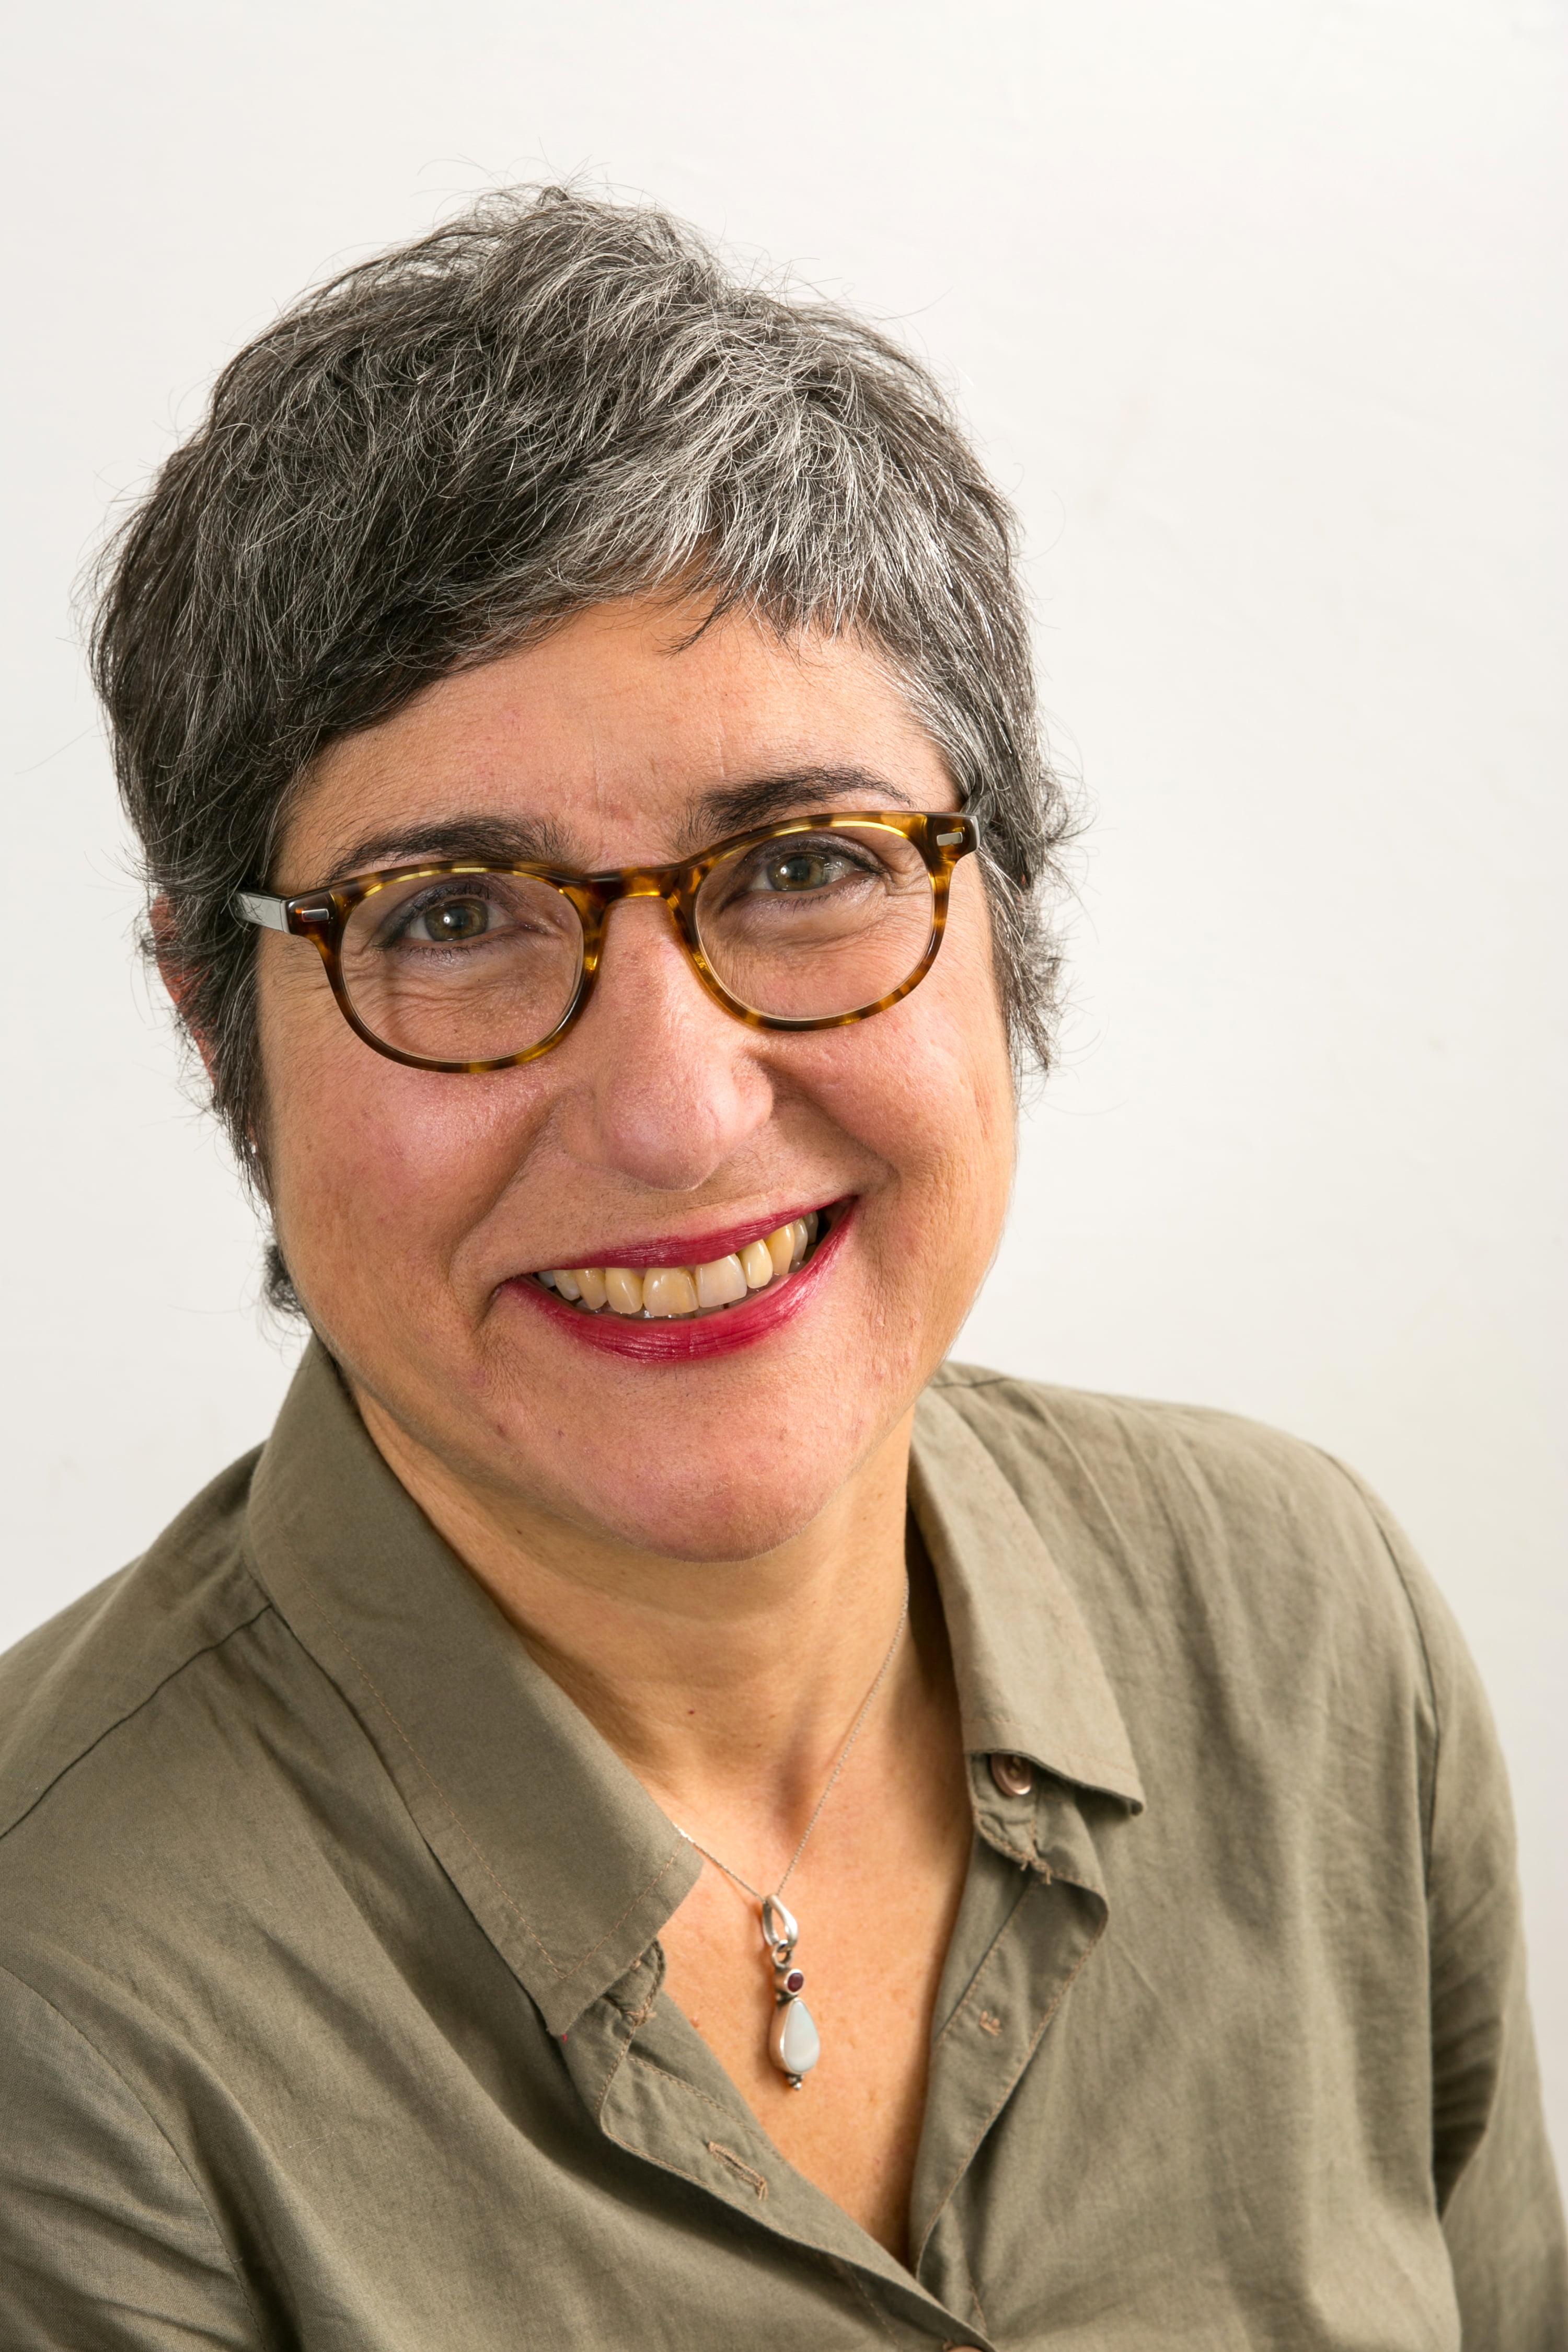 BHESCO; Kayla Ente, Staff portraits;